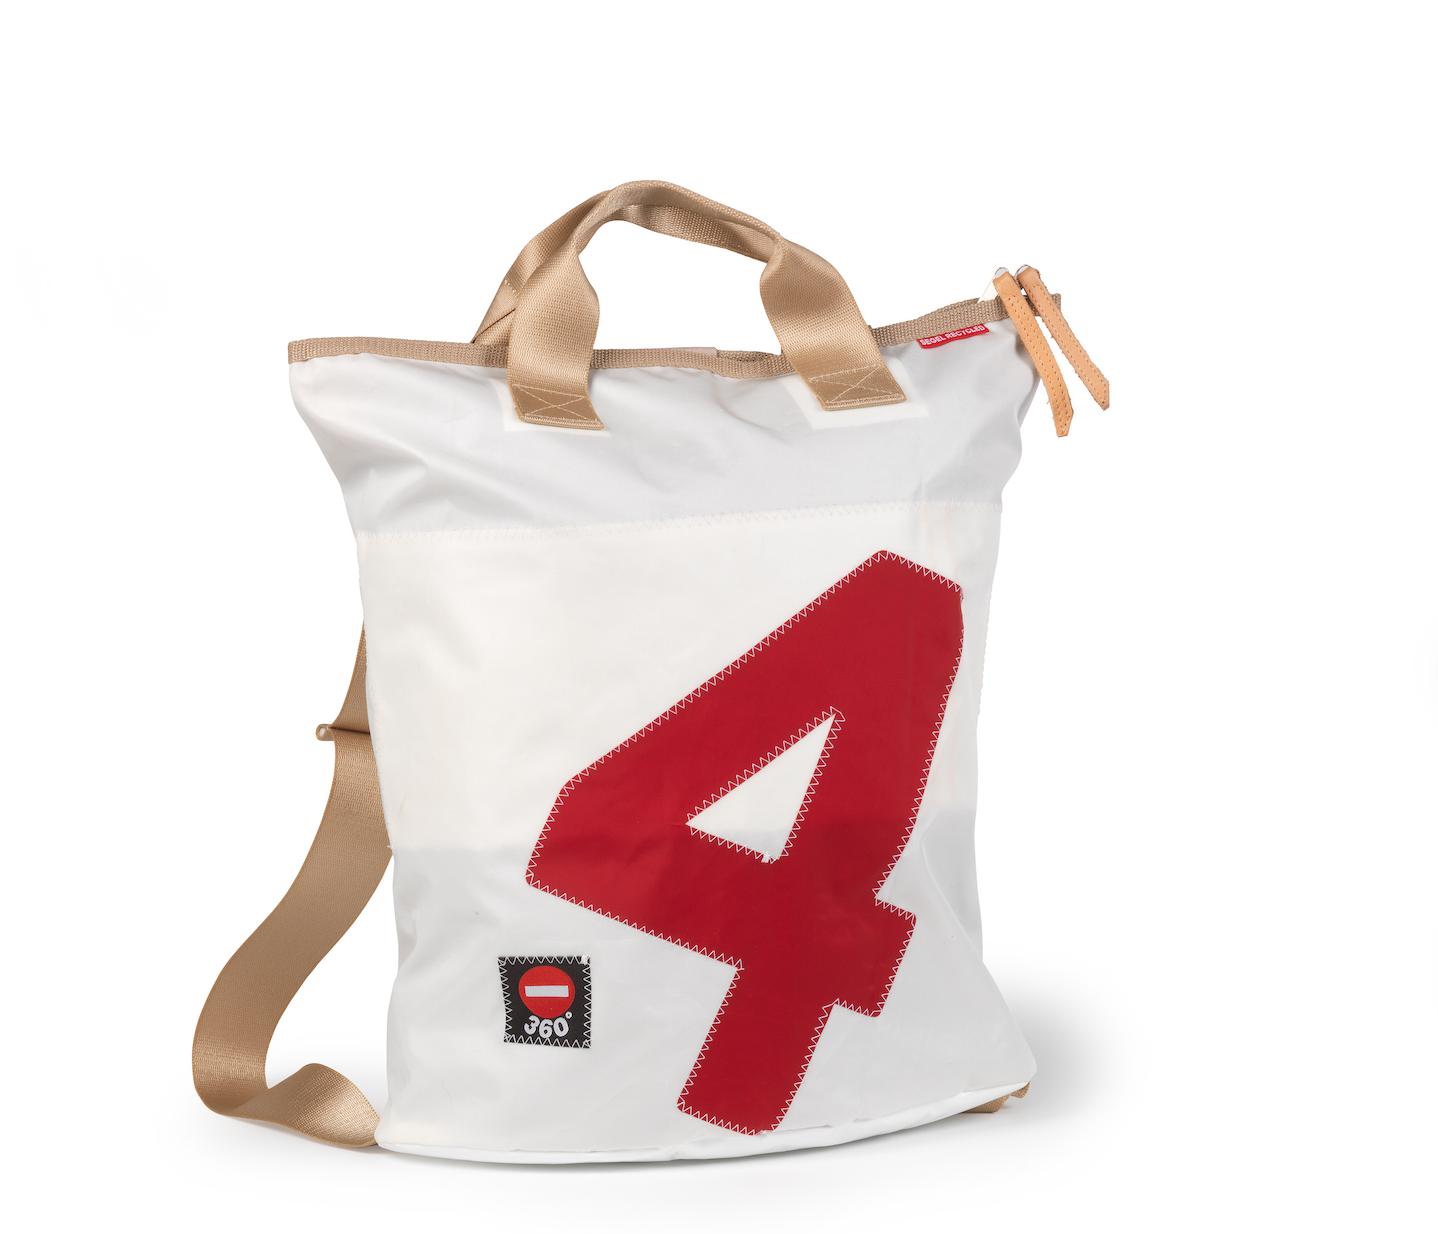 rucksack tasche kombi beautiful tim rucksack mint with. Black Bedroom Furniture Sets. Home Design Ideas